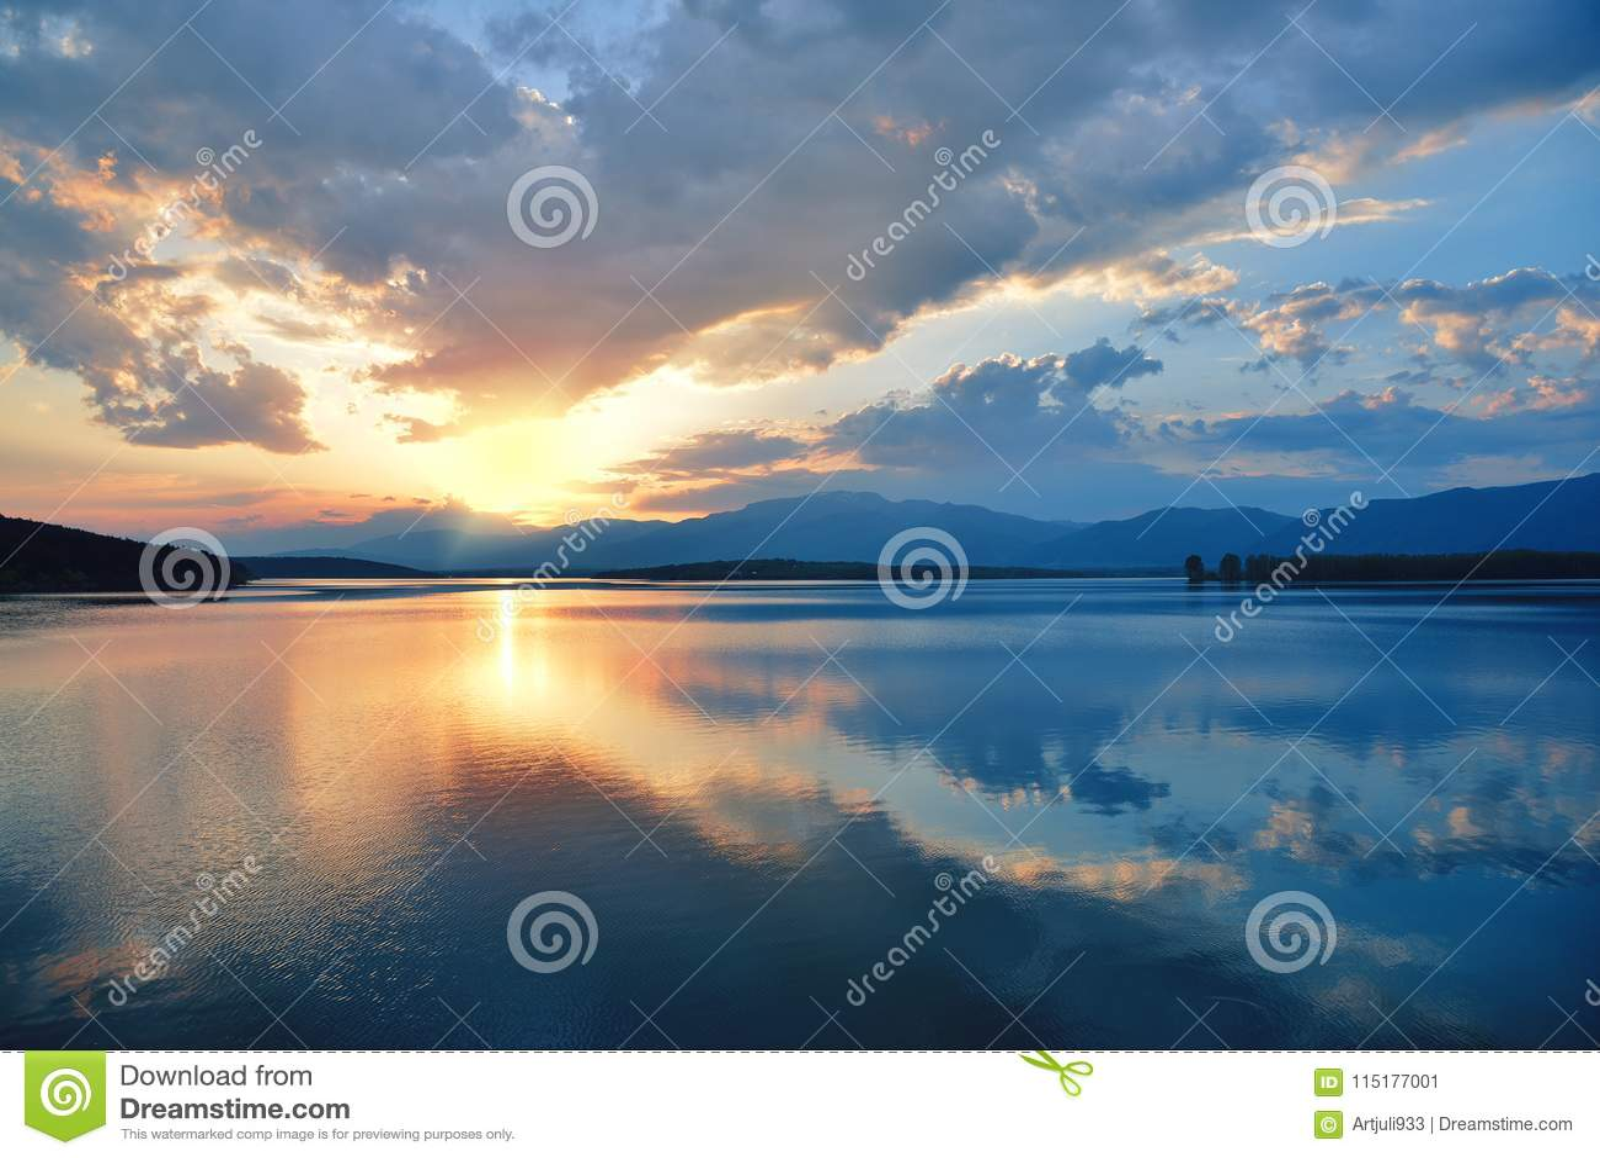 Por do sol Incredibly bonito Sun, lago Por do sol ou paisagem do nascer do sol, panorama da natureza bonita Céu que surpreende nu